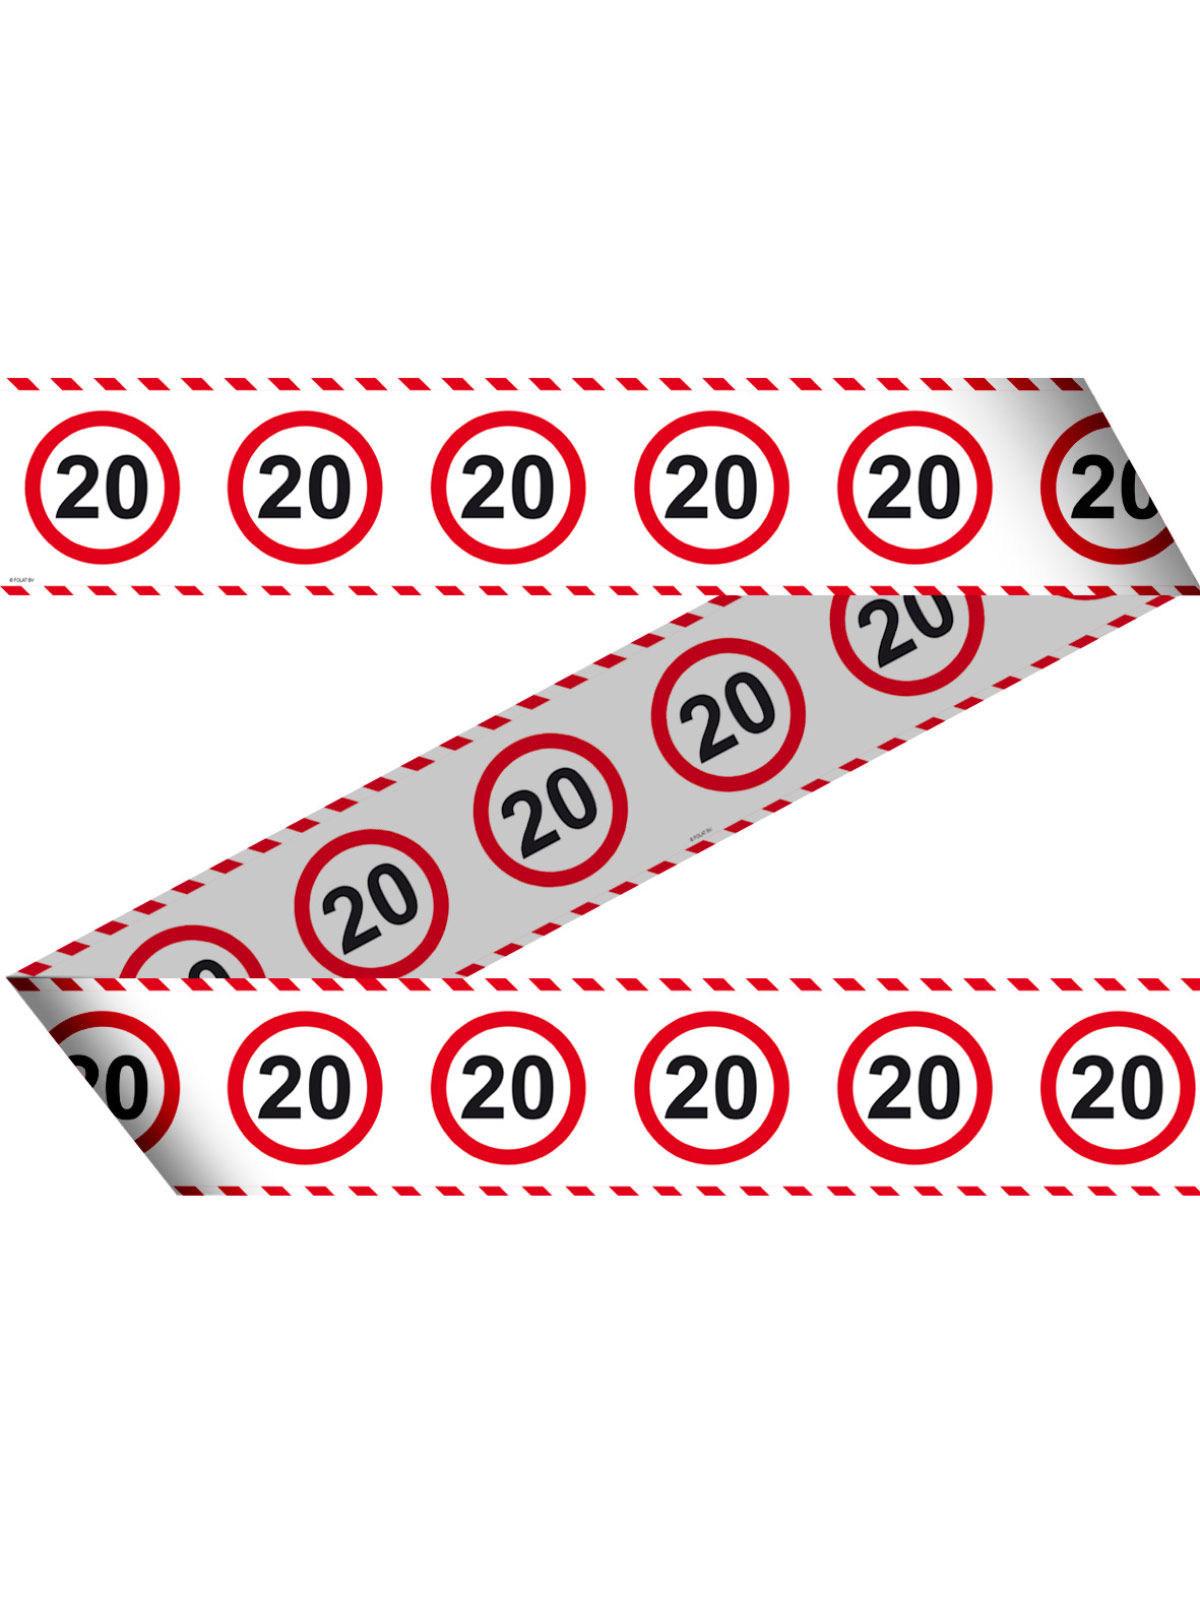 20 Geburtstag Absperrband Party Deko Weiss Rot Schwarz 15mx7 5cm